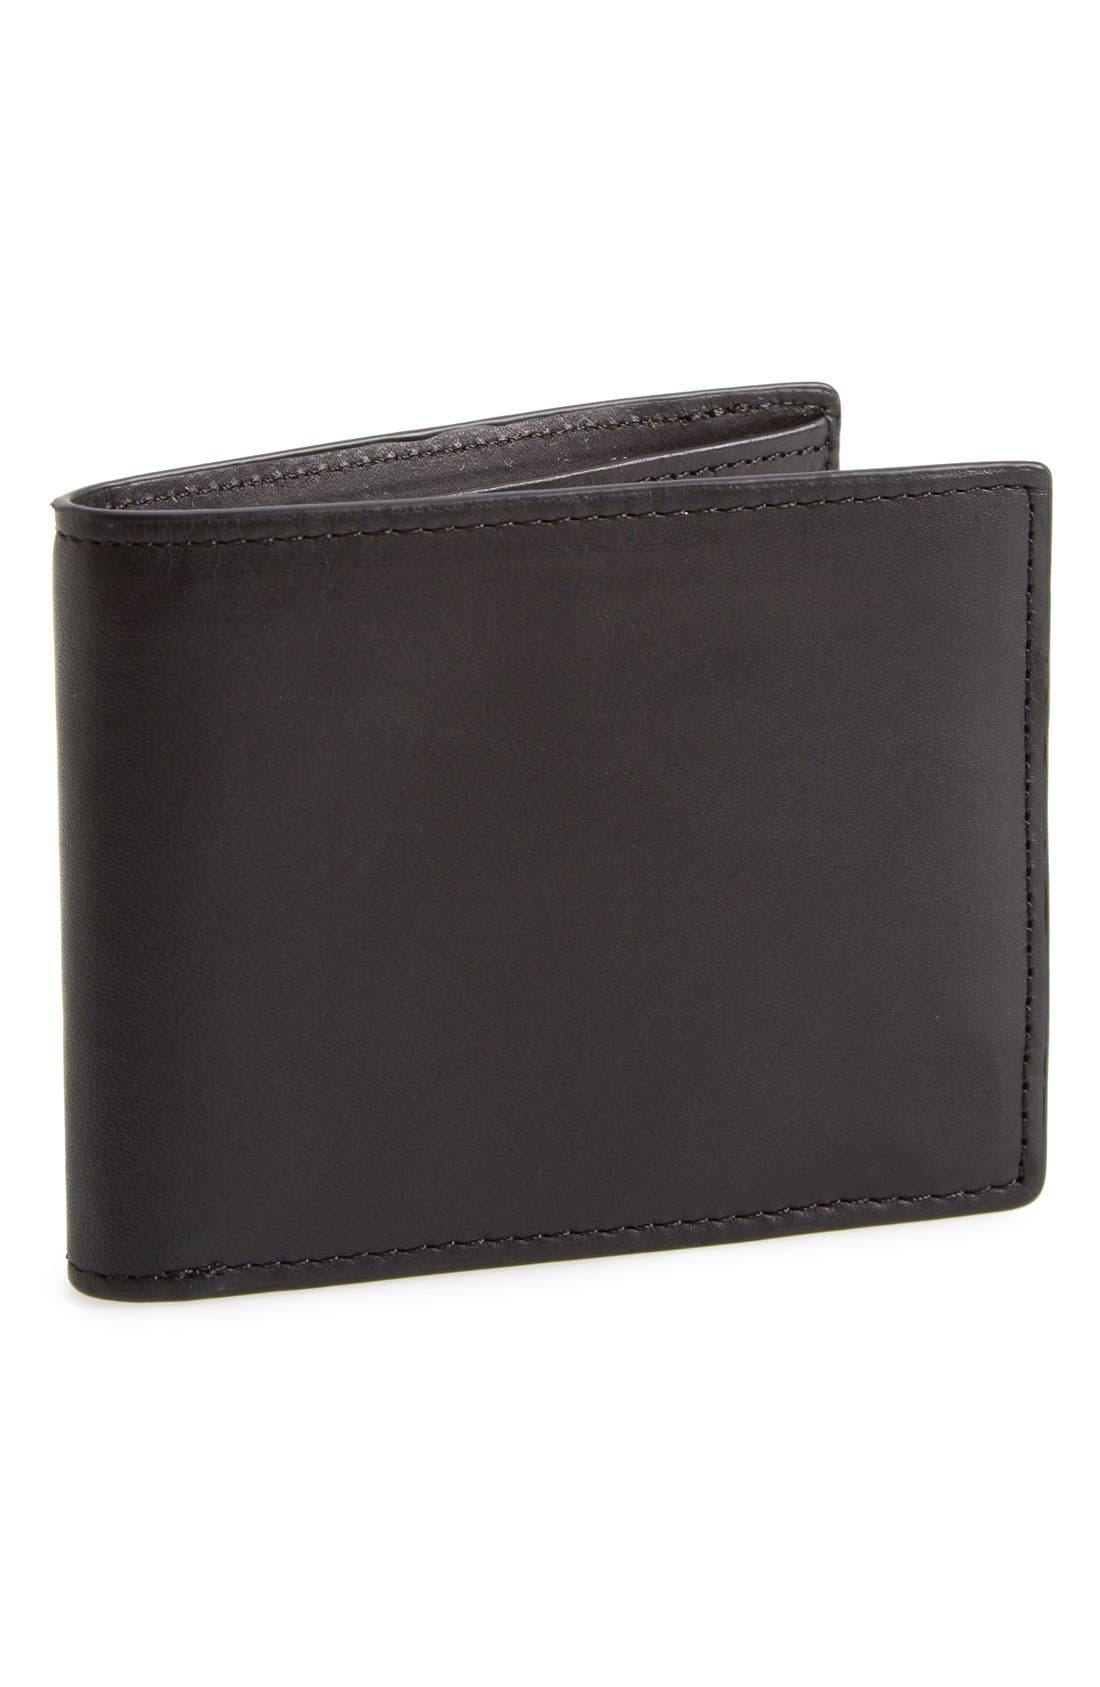 Alternate Image 1 Selected - rag & bone Hampshire Leather Bifold Wallet